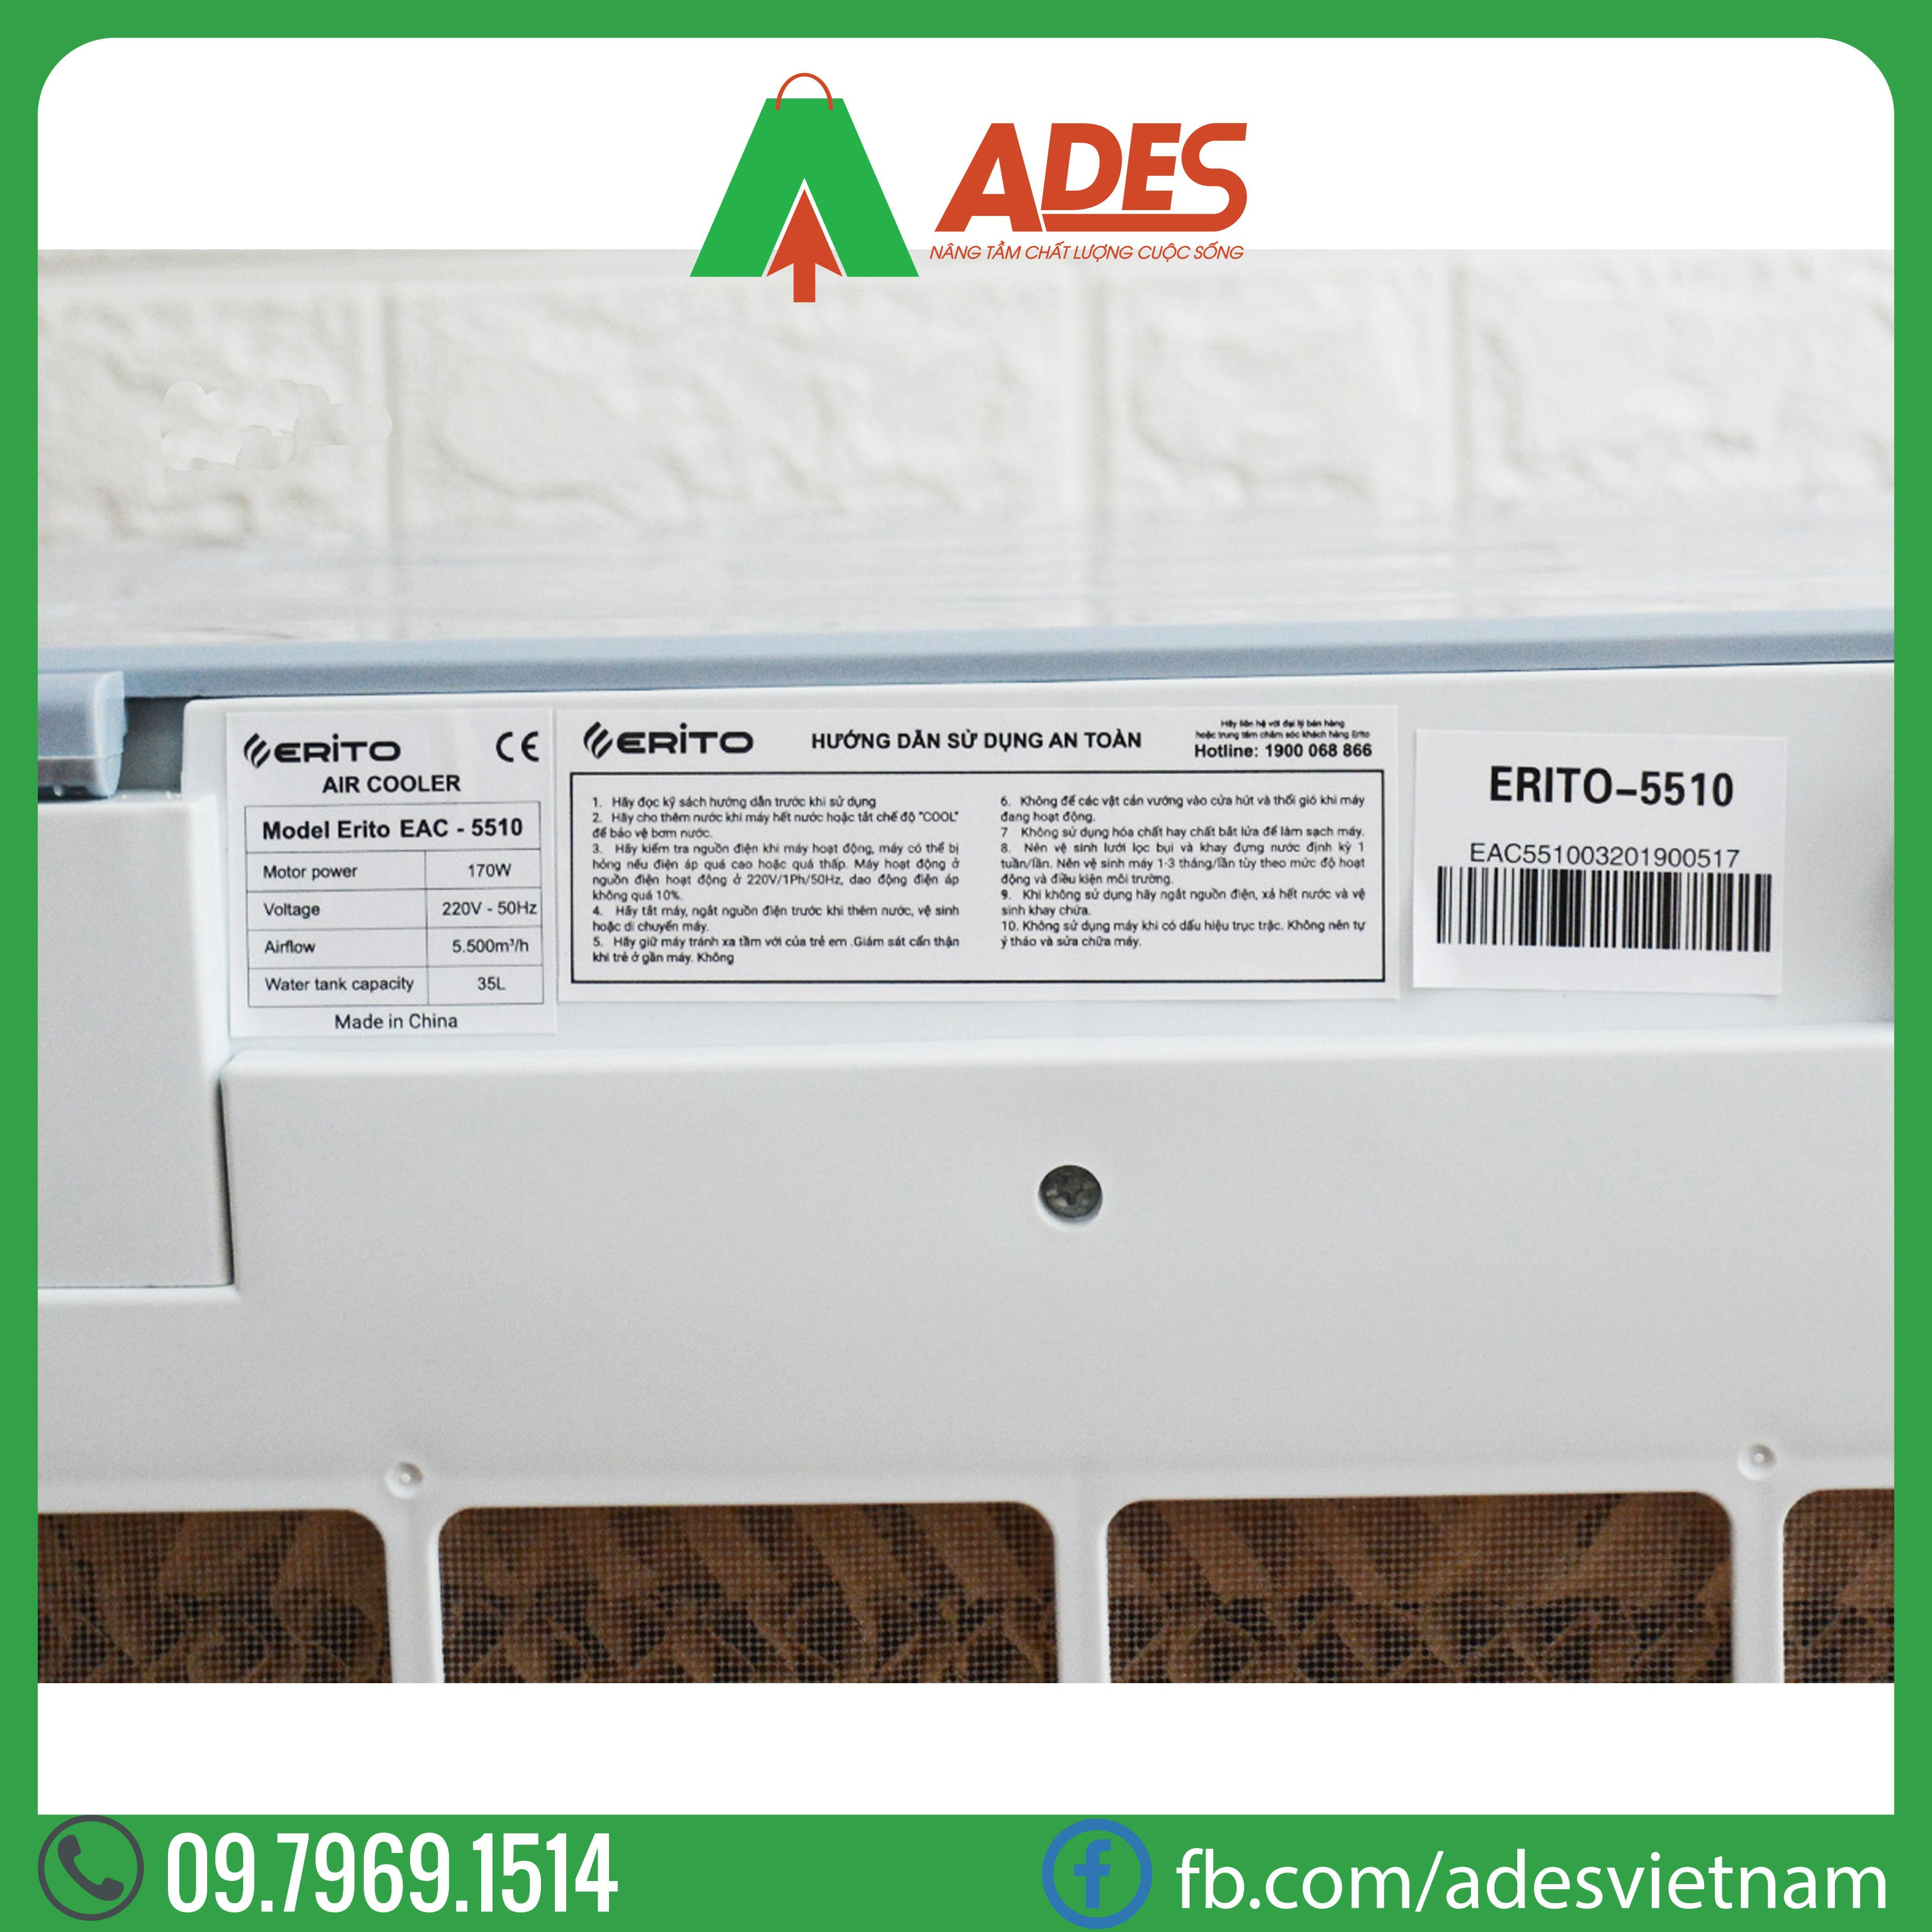 Quat dieu hoa EritoEAC-5510 (35 lit)